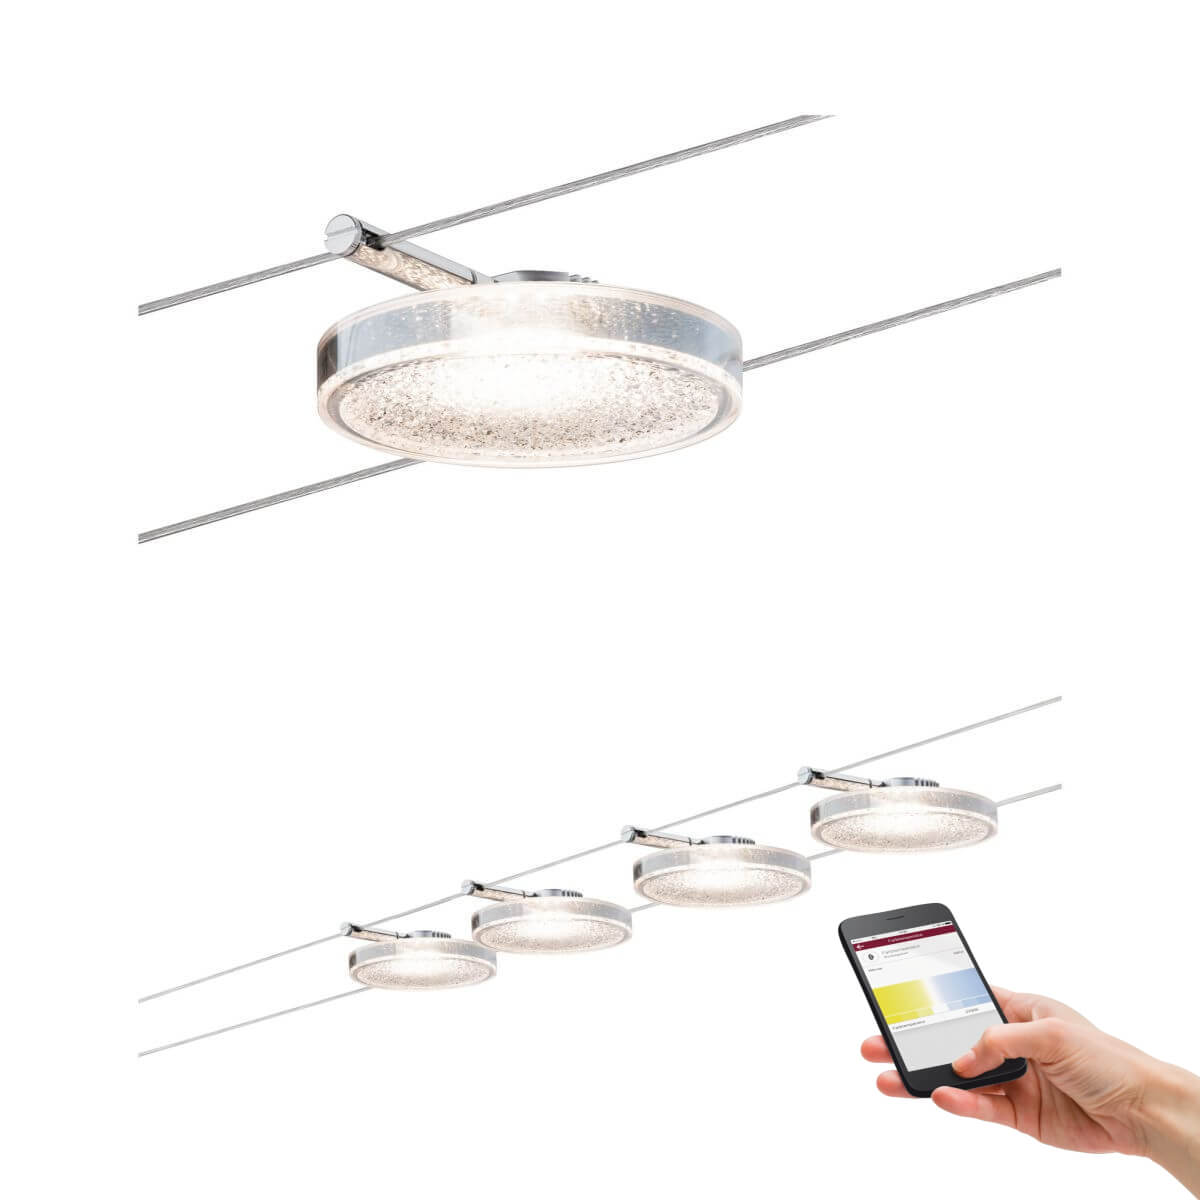 paulmann smart led seilsystem discled ii 4x4w dc mit wei lichtsteuerung ber app smart home. Black Bedroom Furniture Sets. Home Design Ideas